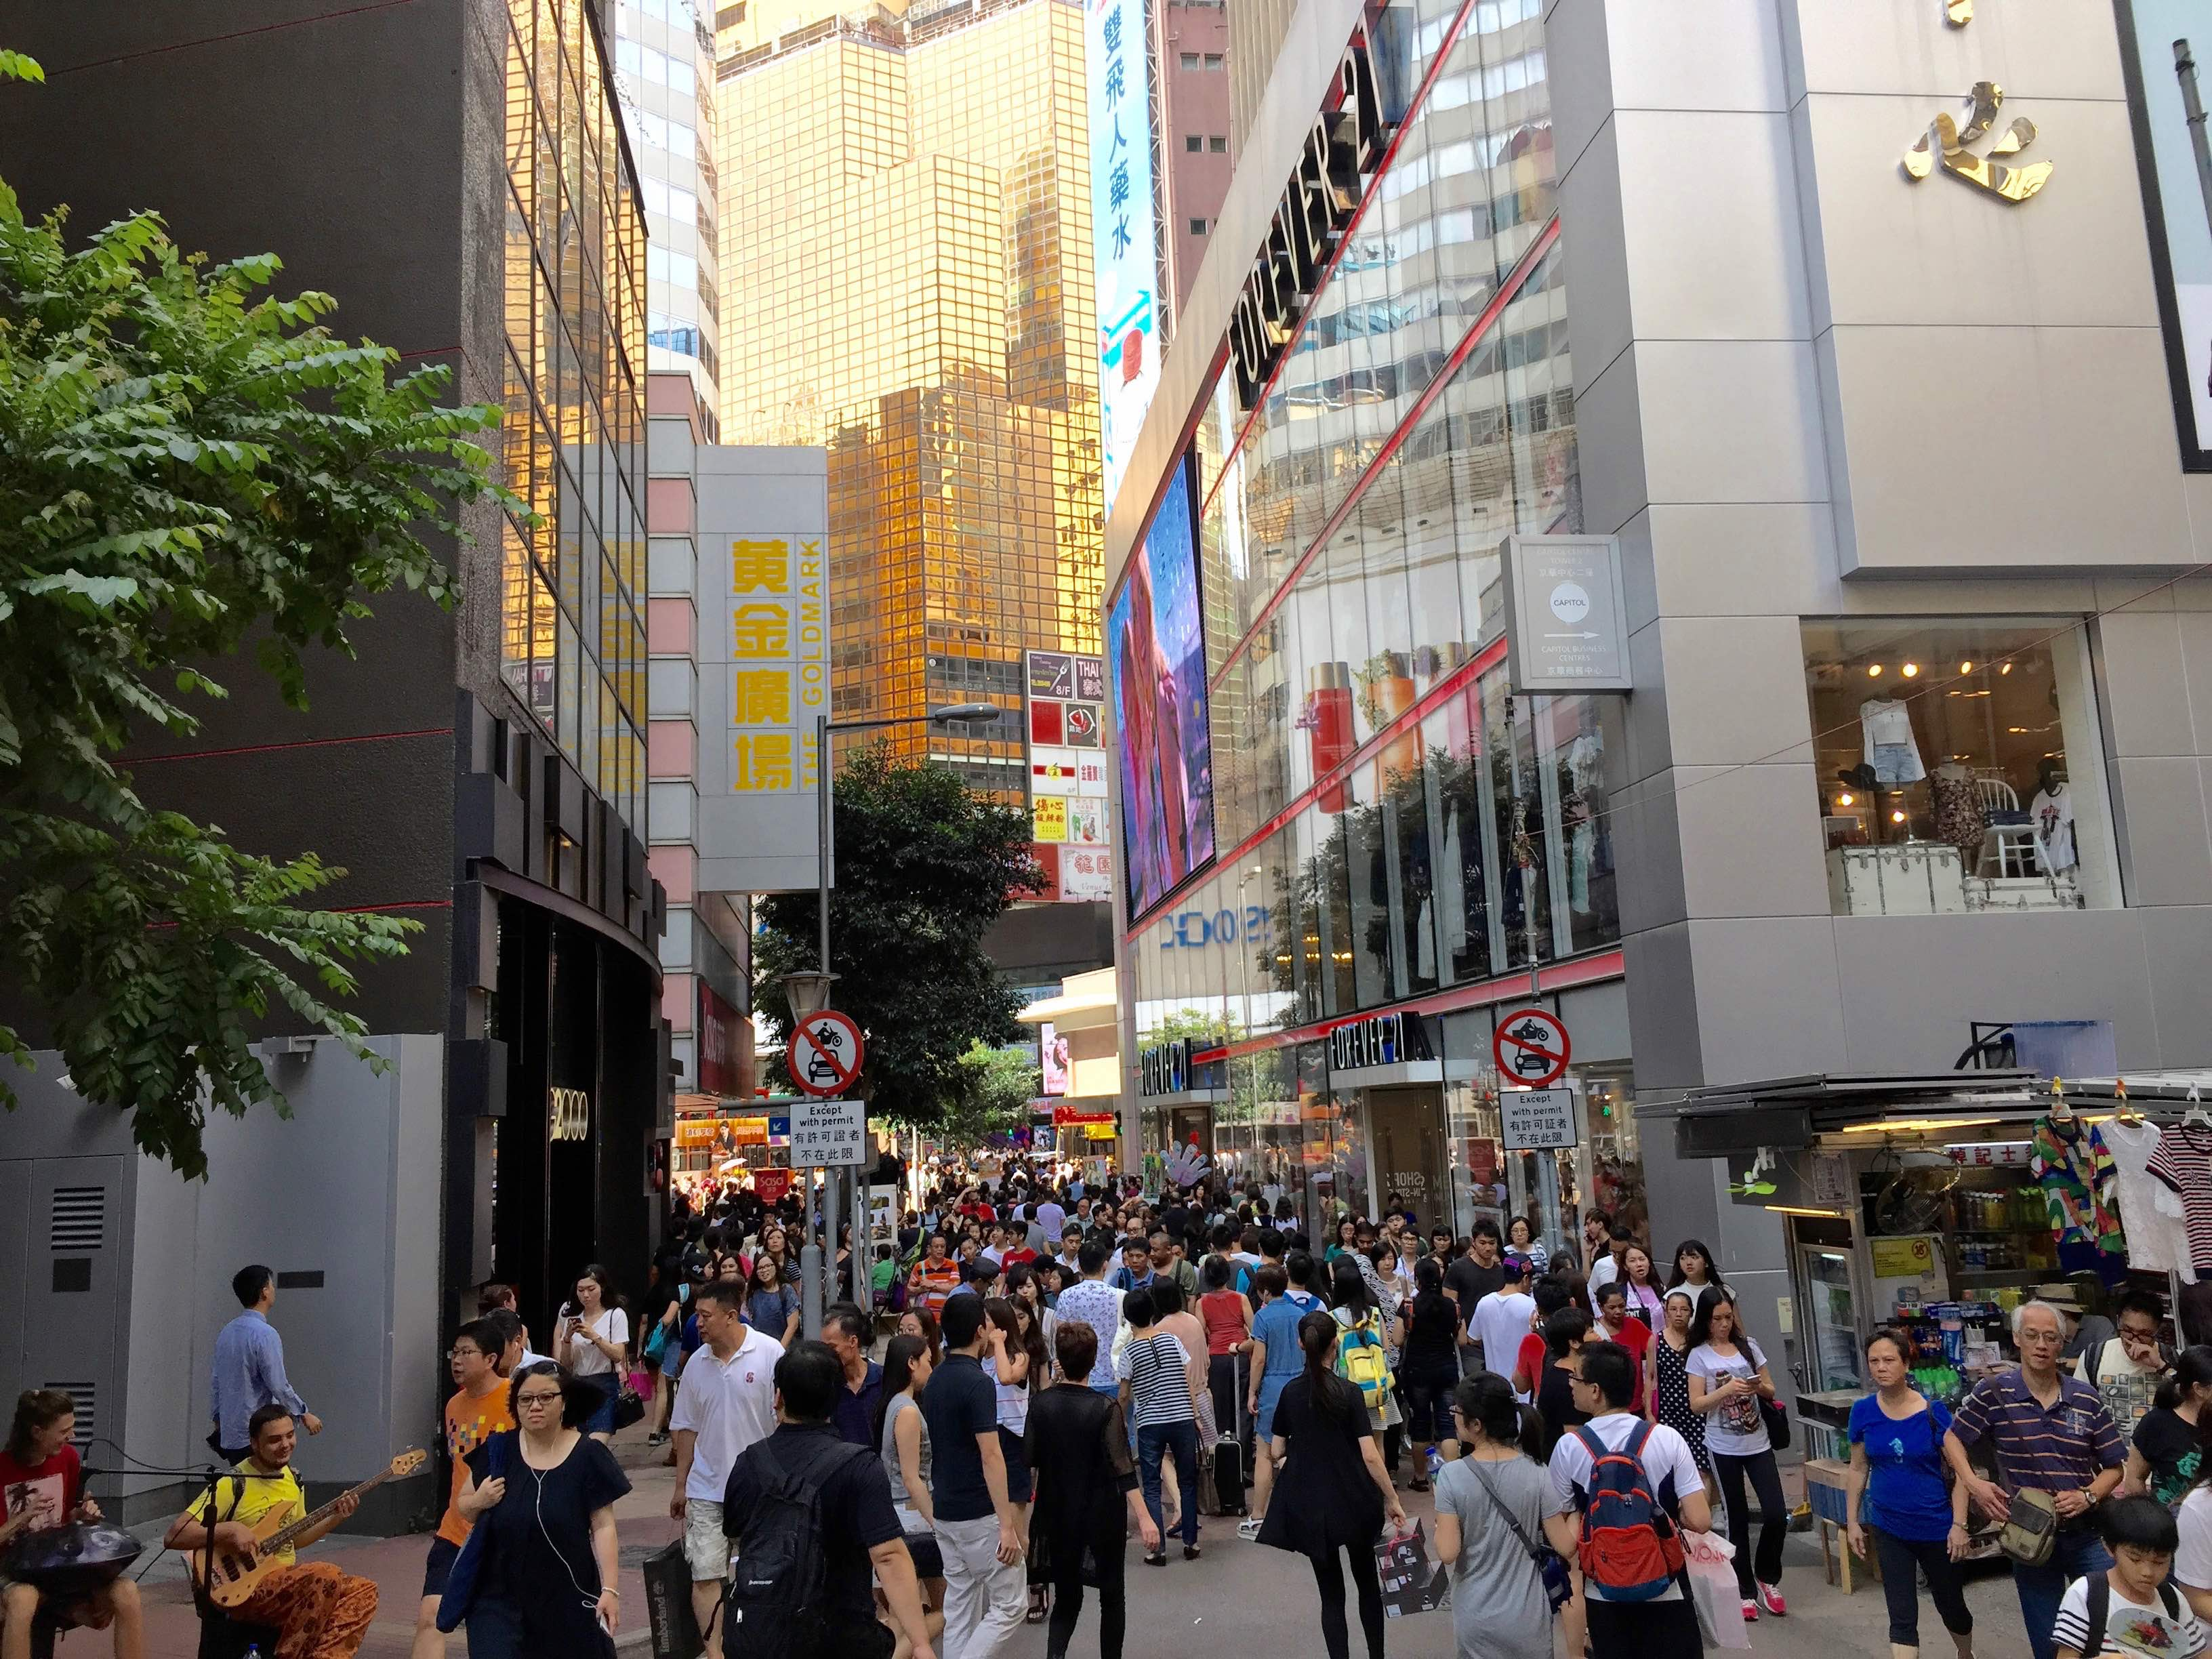 Causeway Bay - high traffic day and night